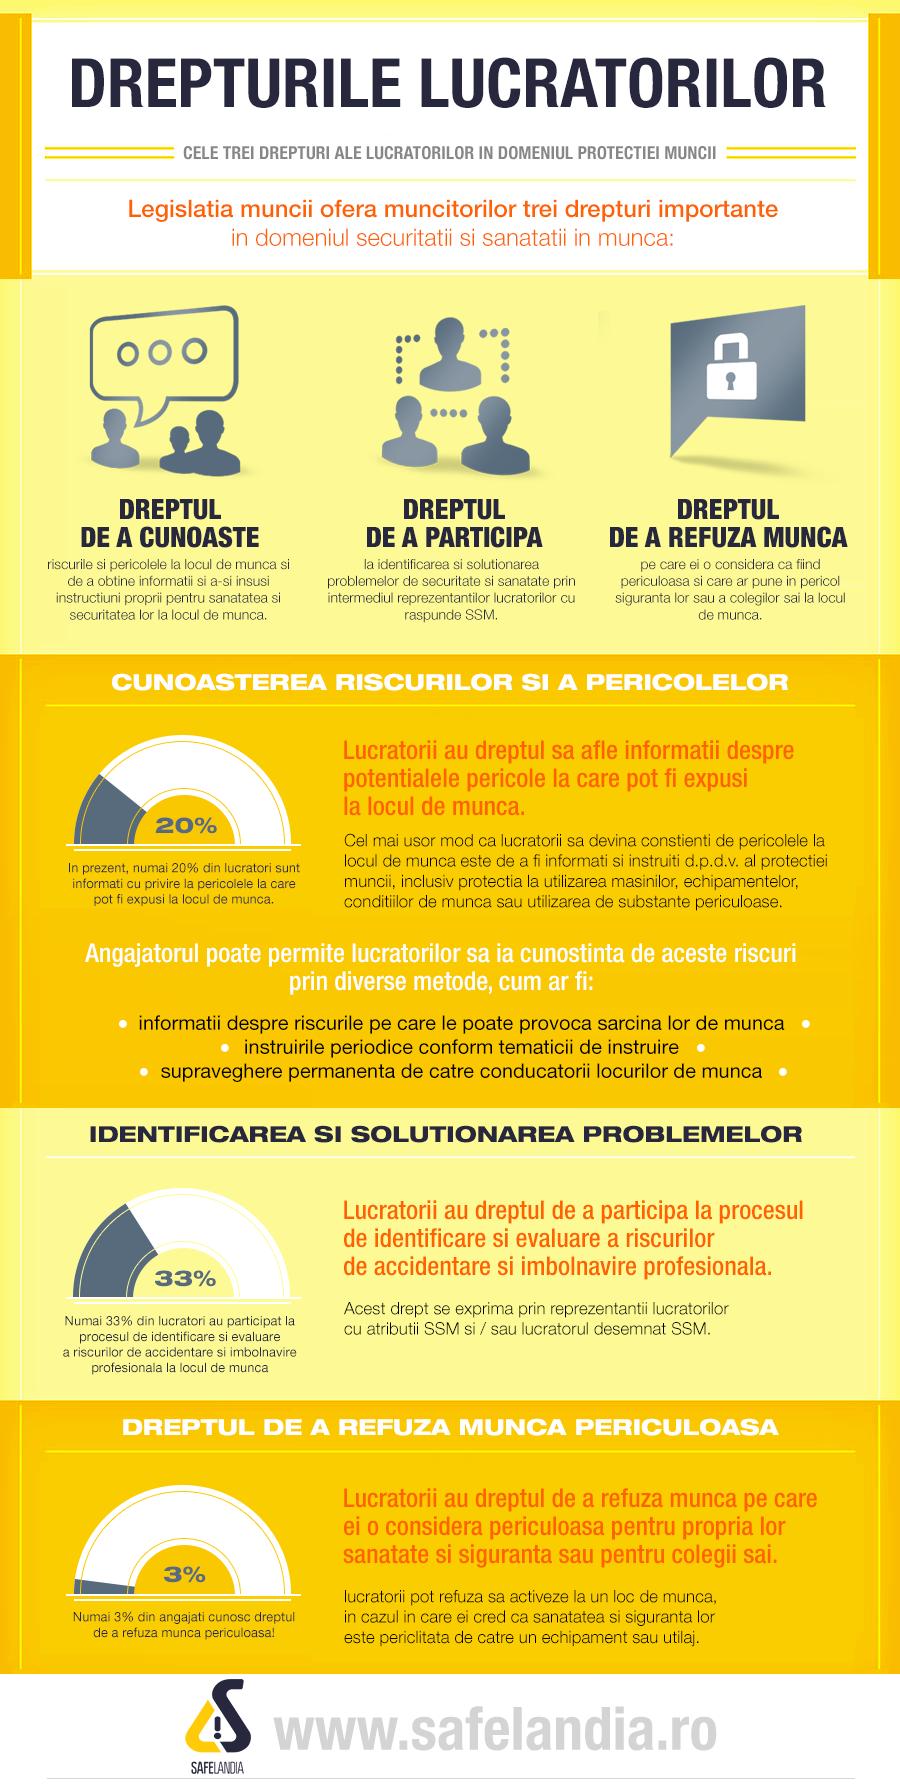 infographic_new